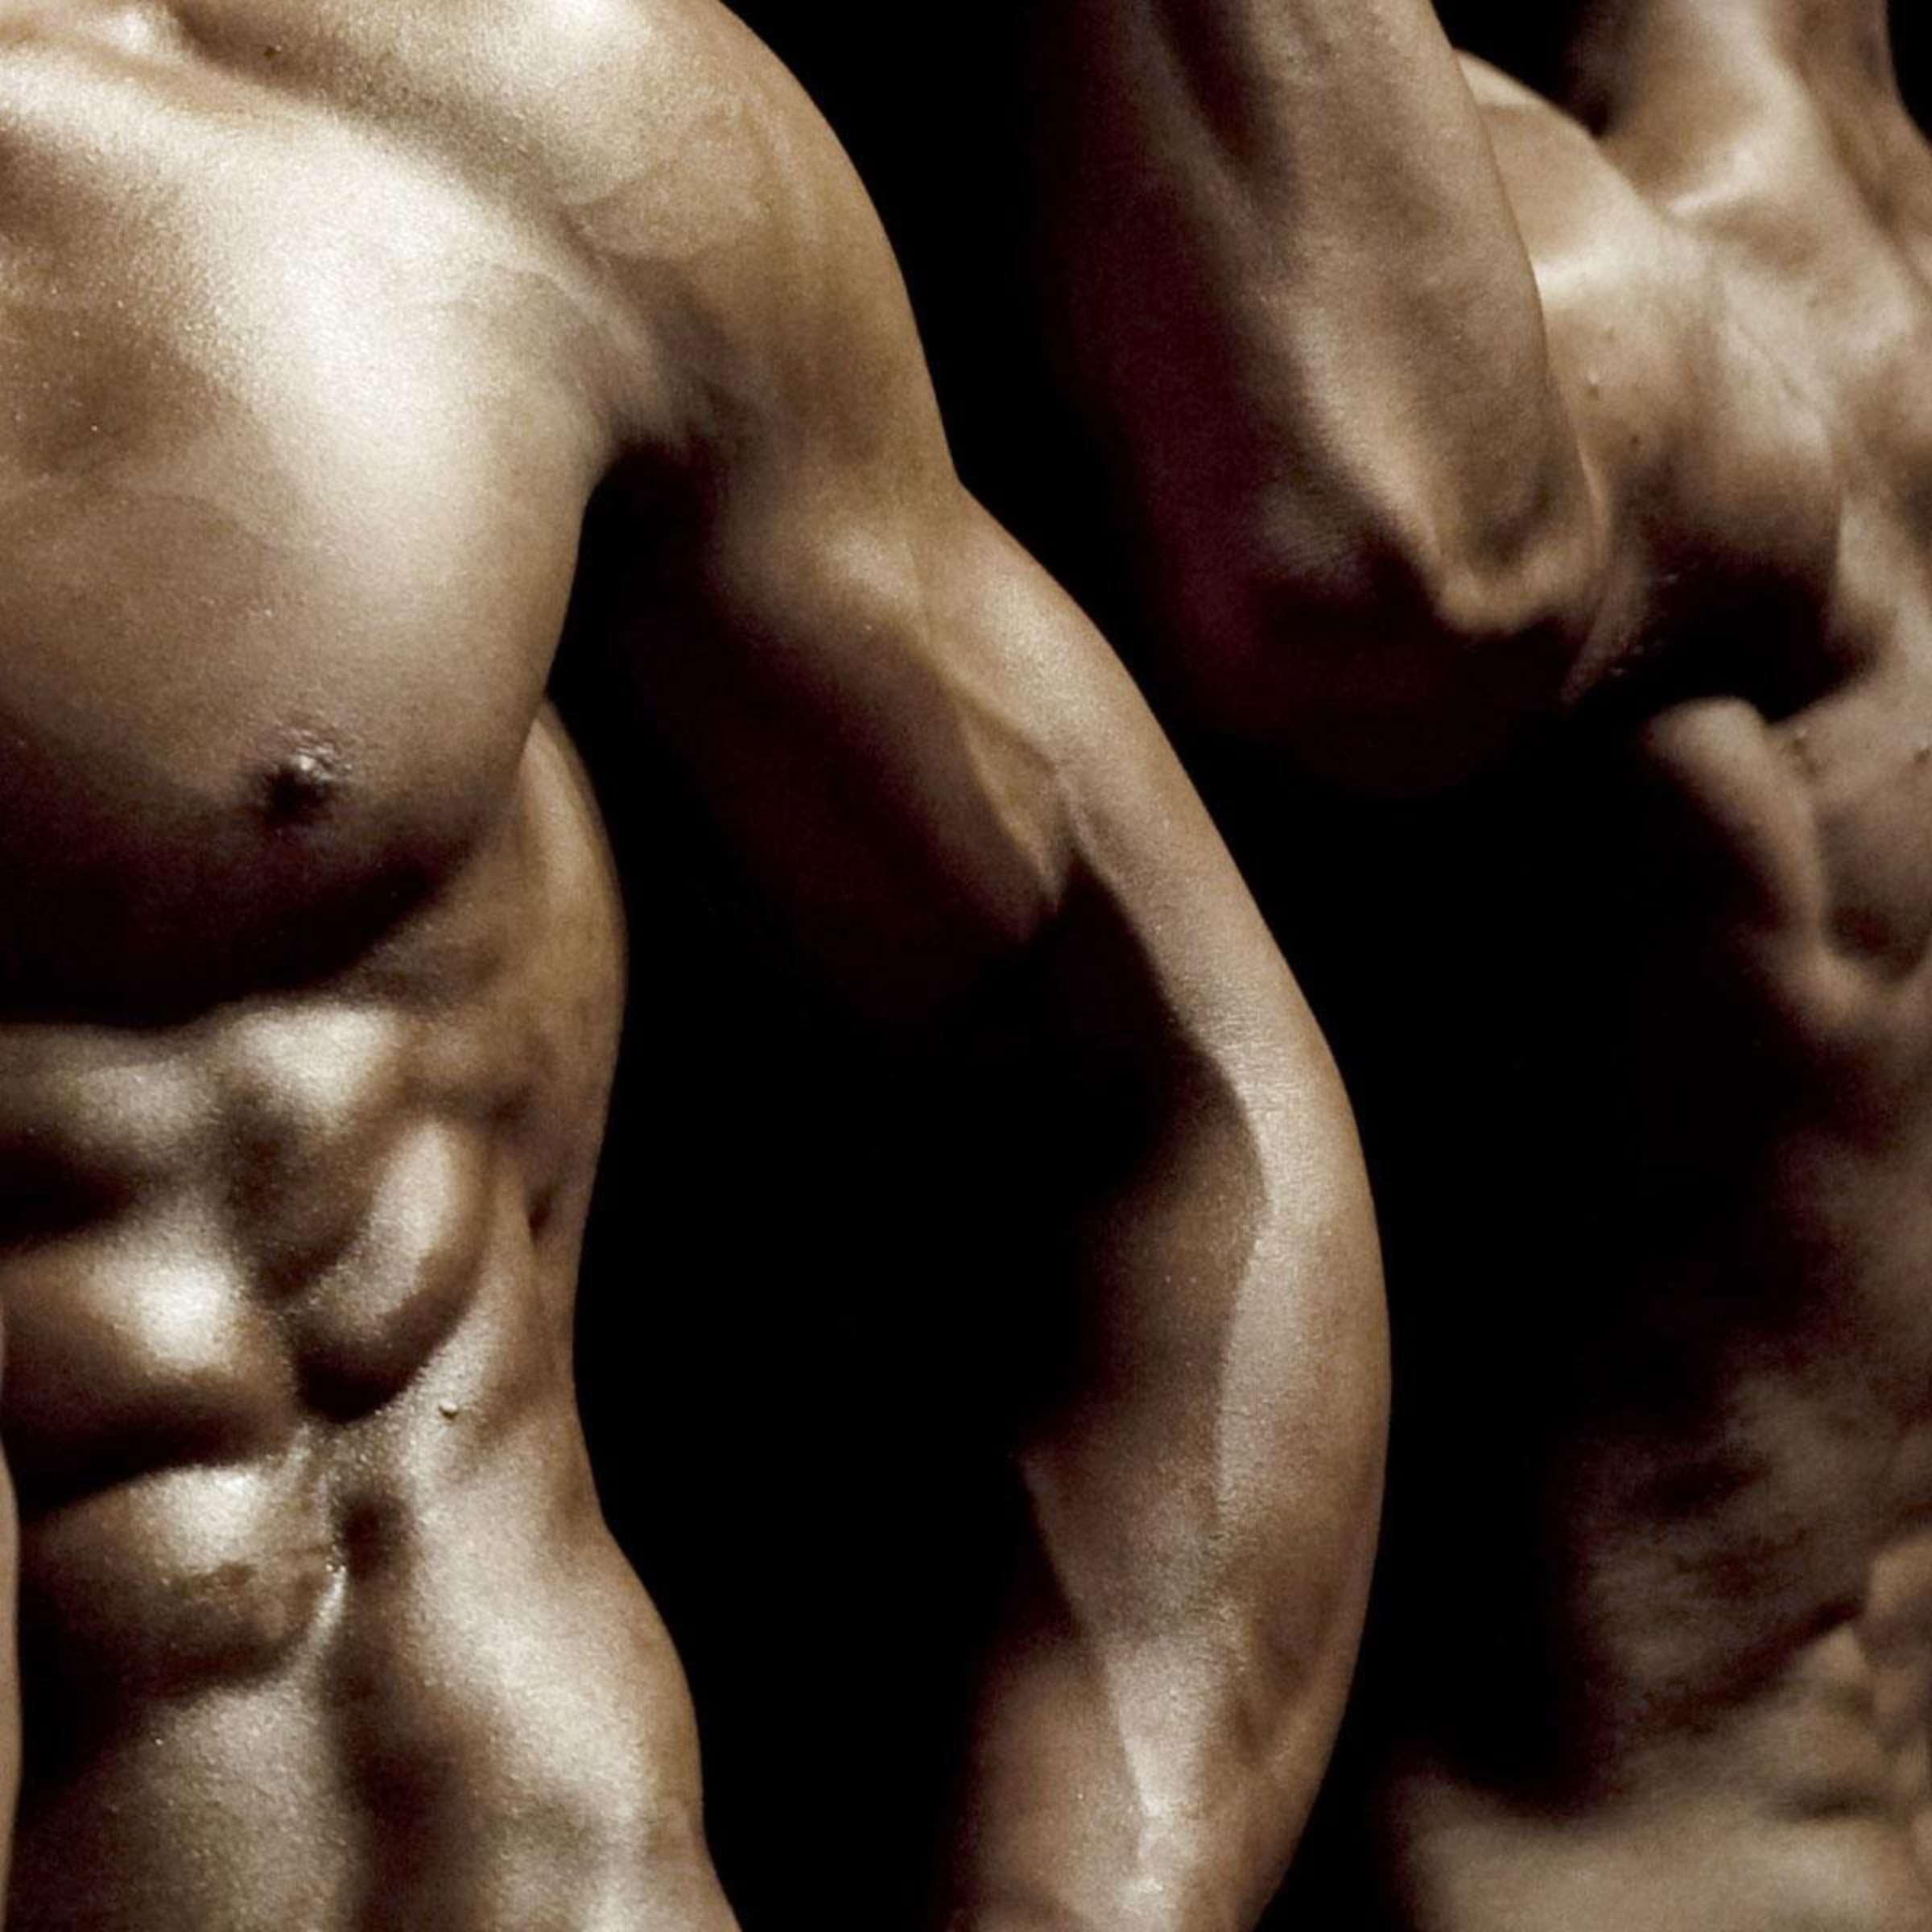 Körperbehaarung mann starke Übermäßige Behaarung: